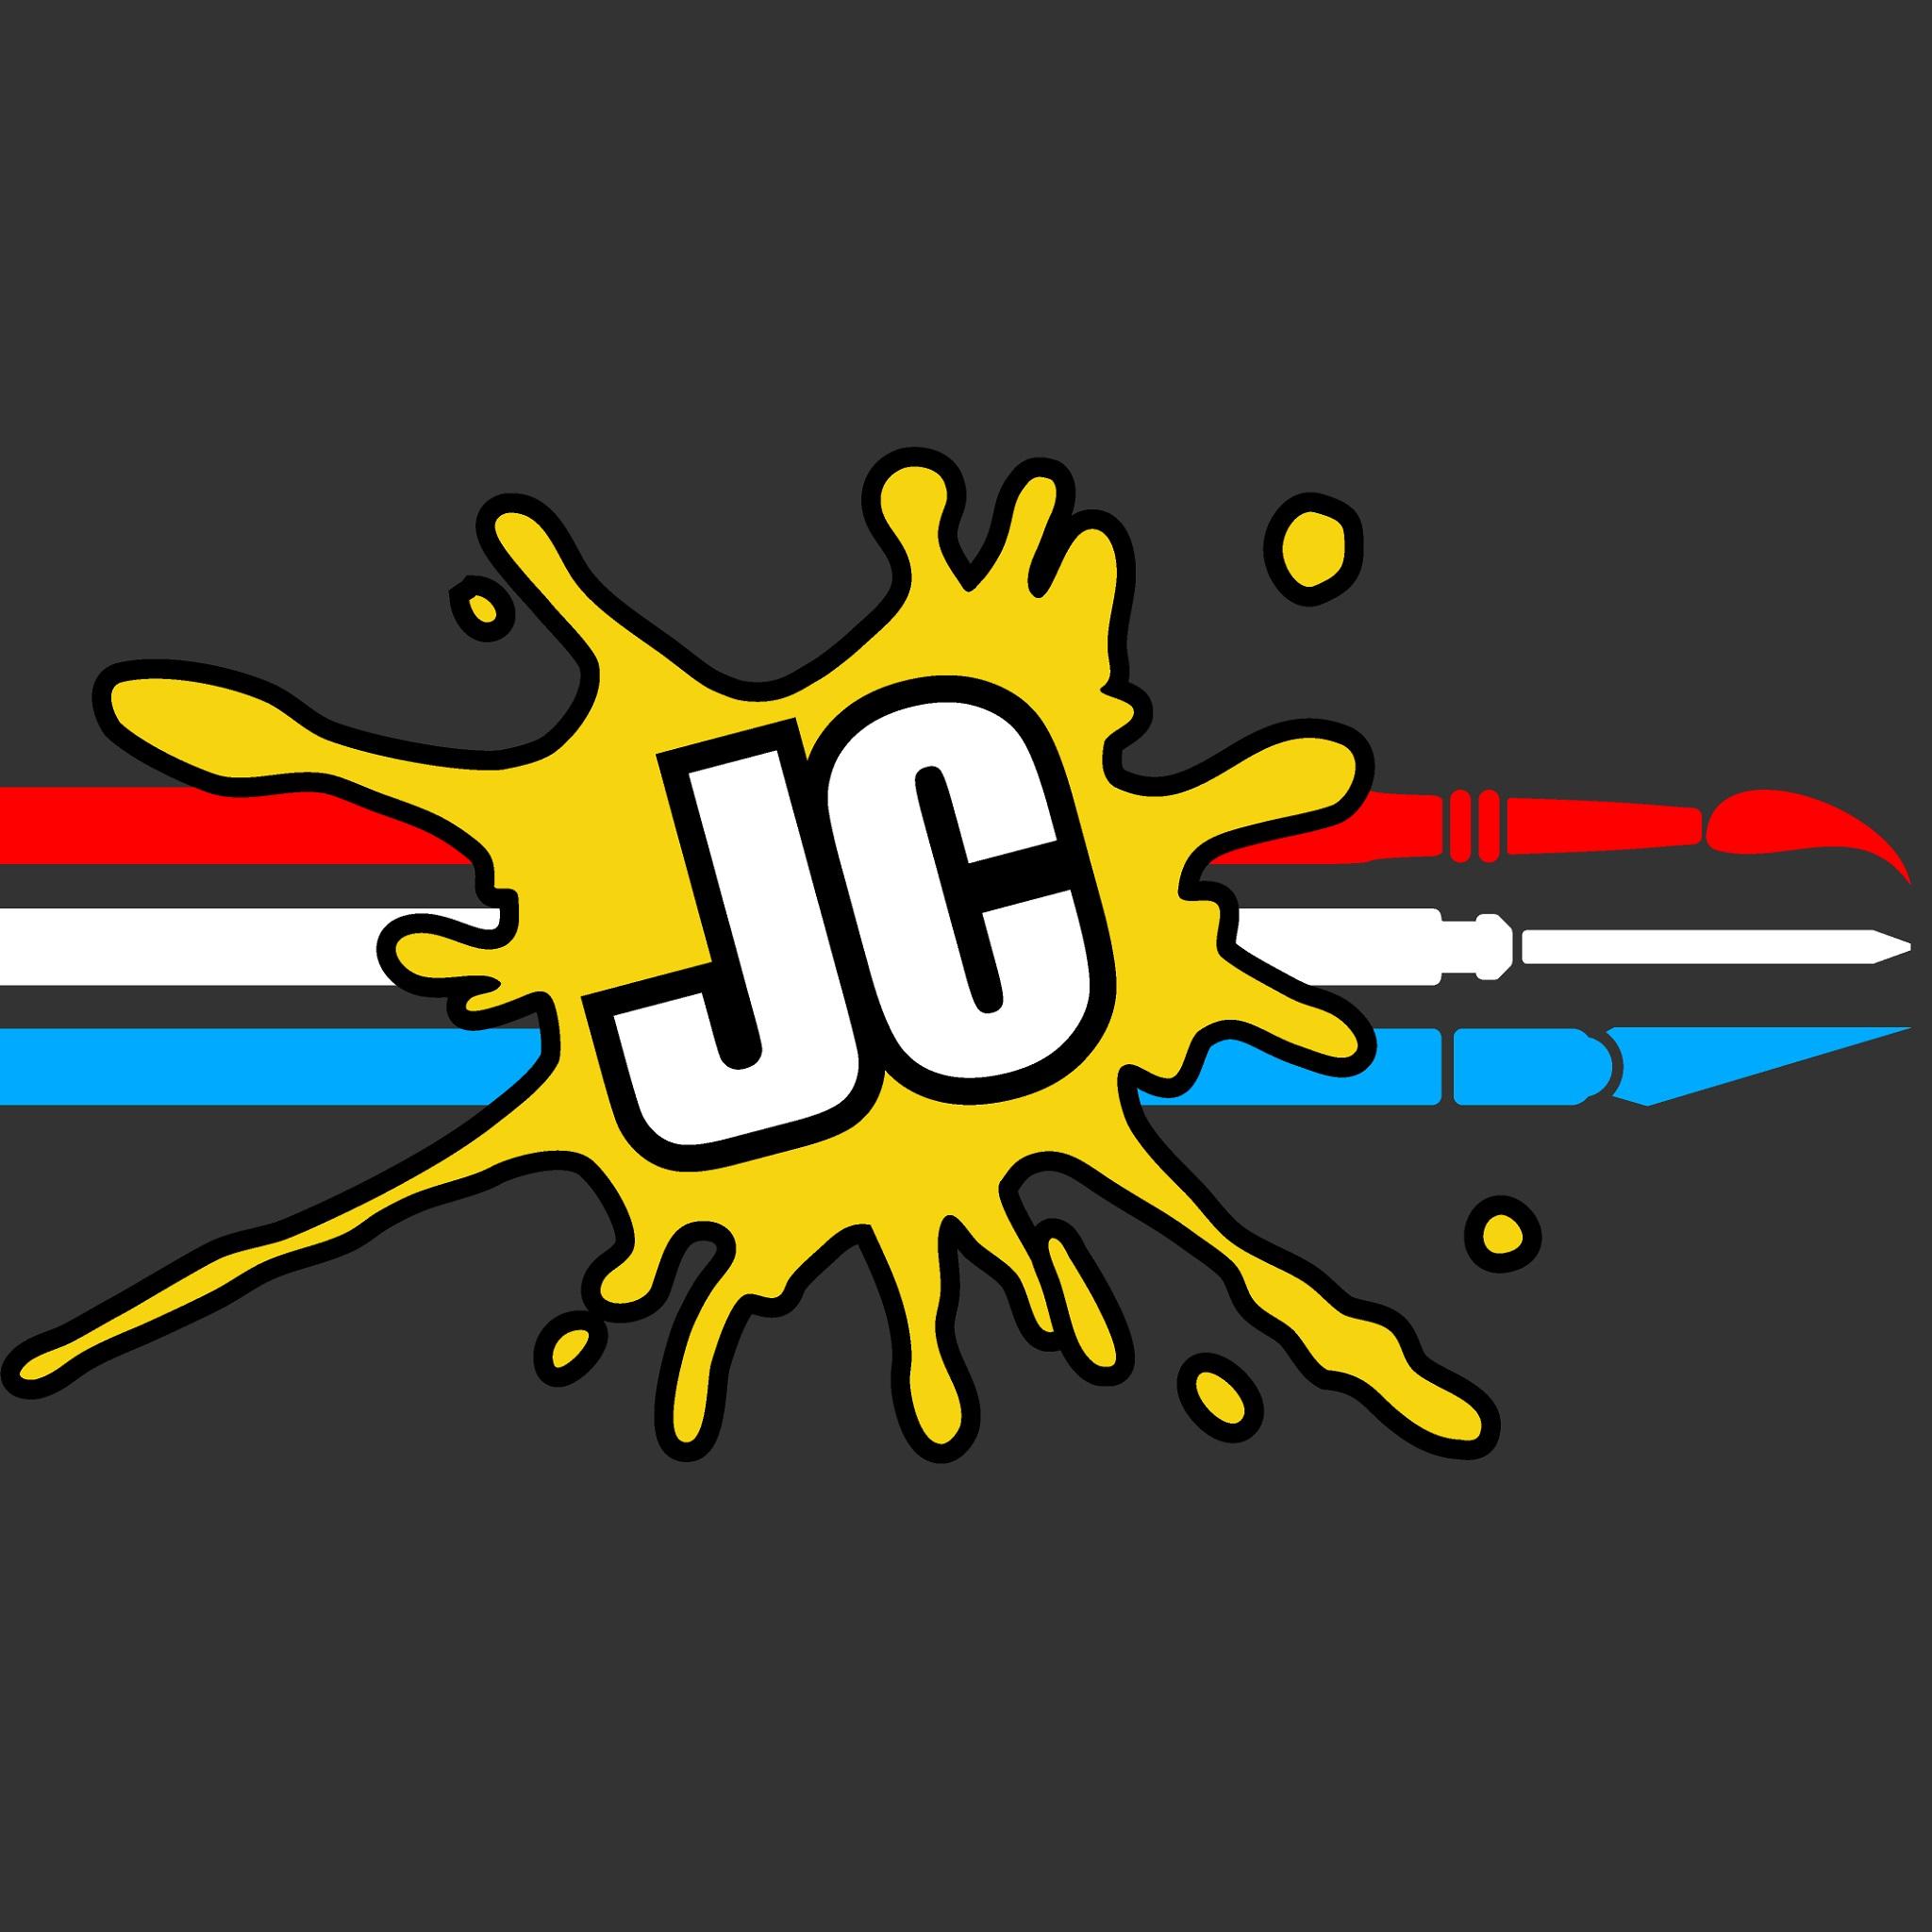 JoeCustoms.com